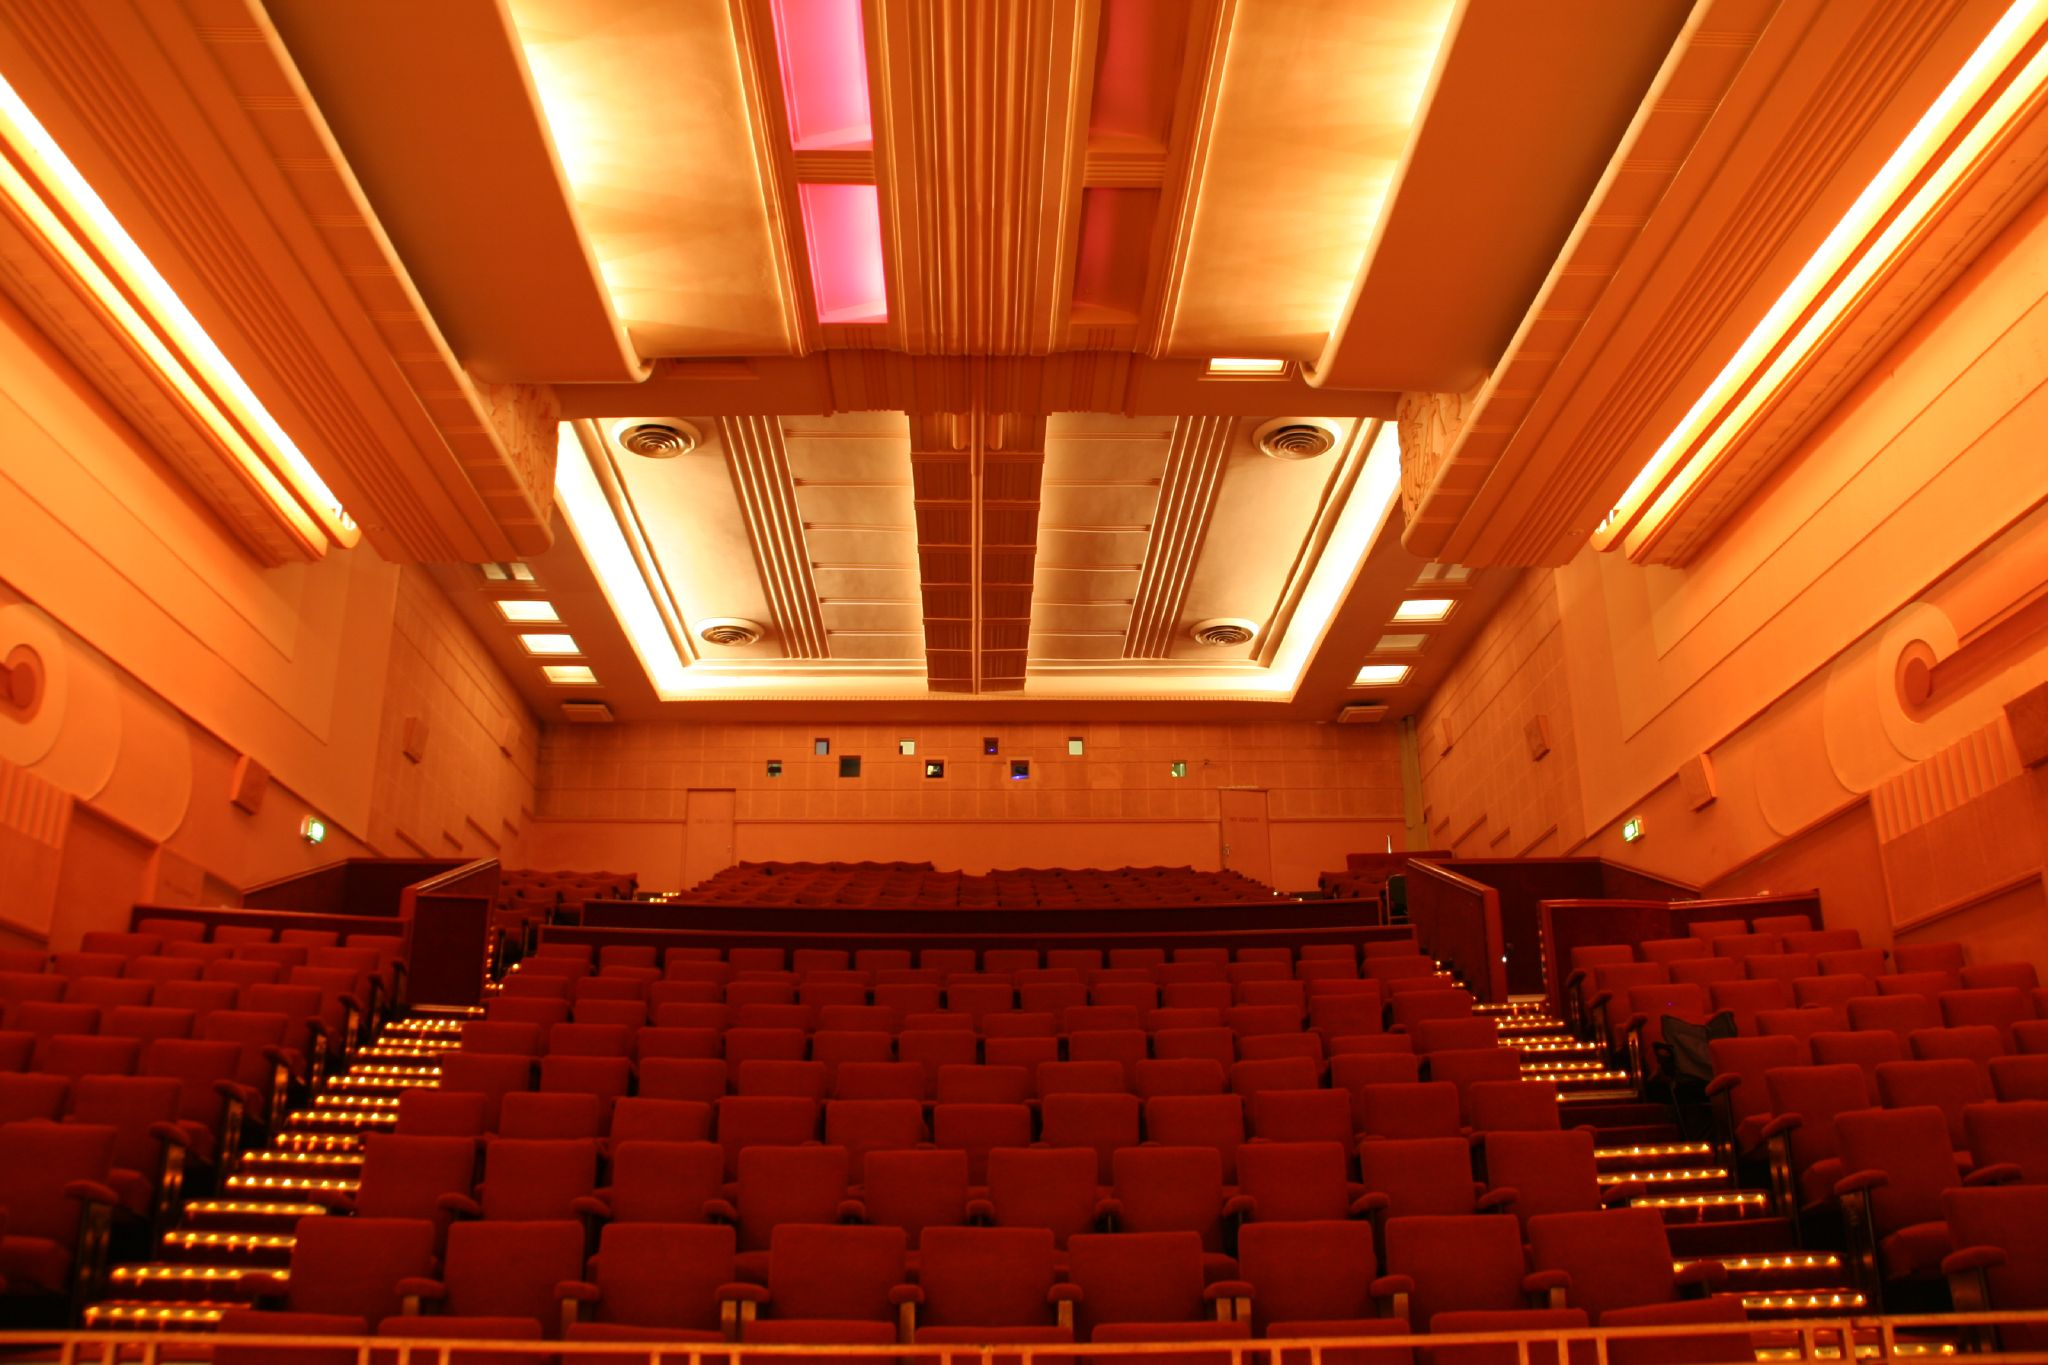 Piccadilly Cinema via Wikicommons